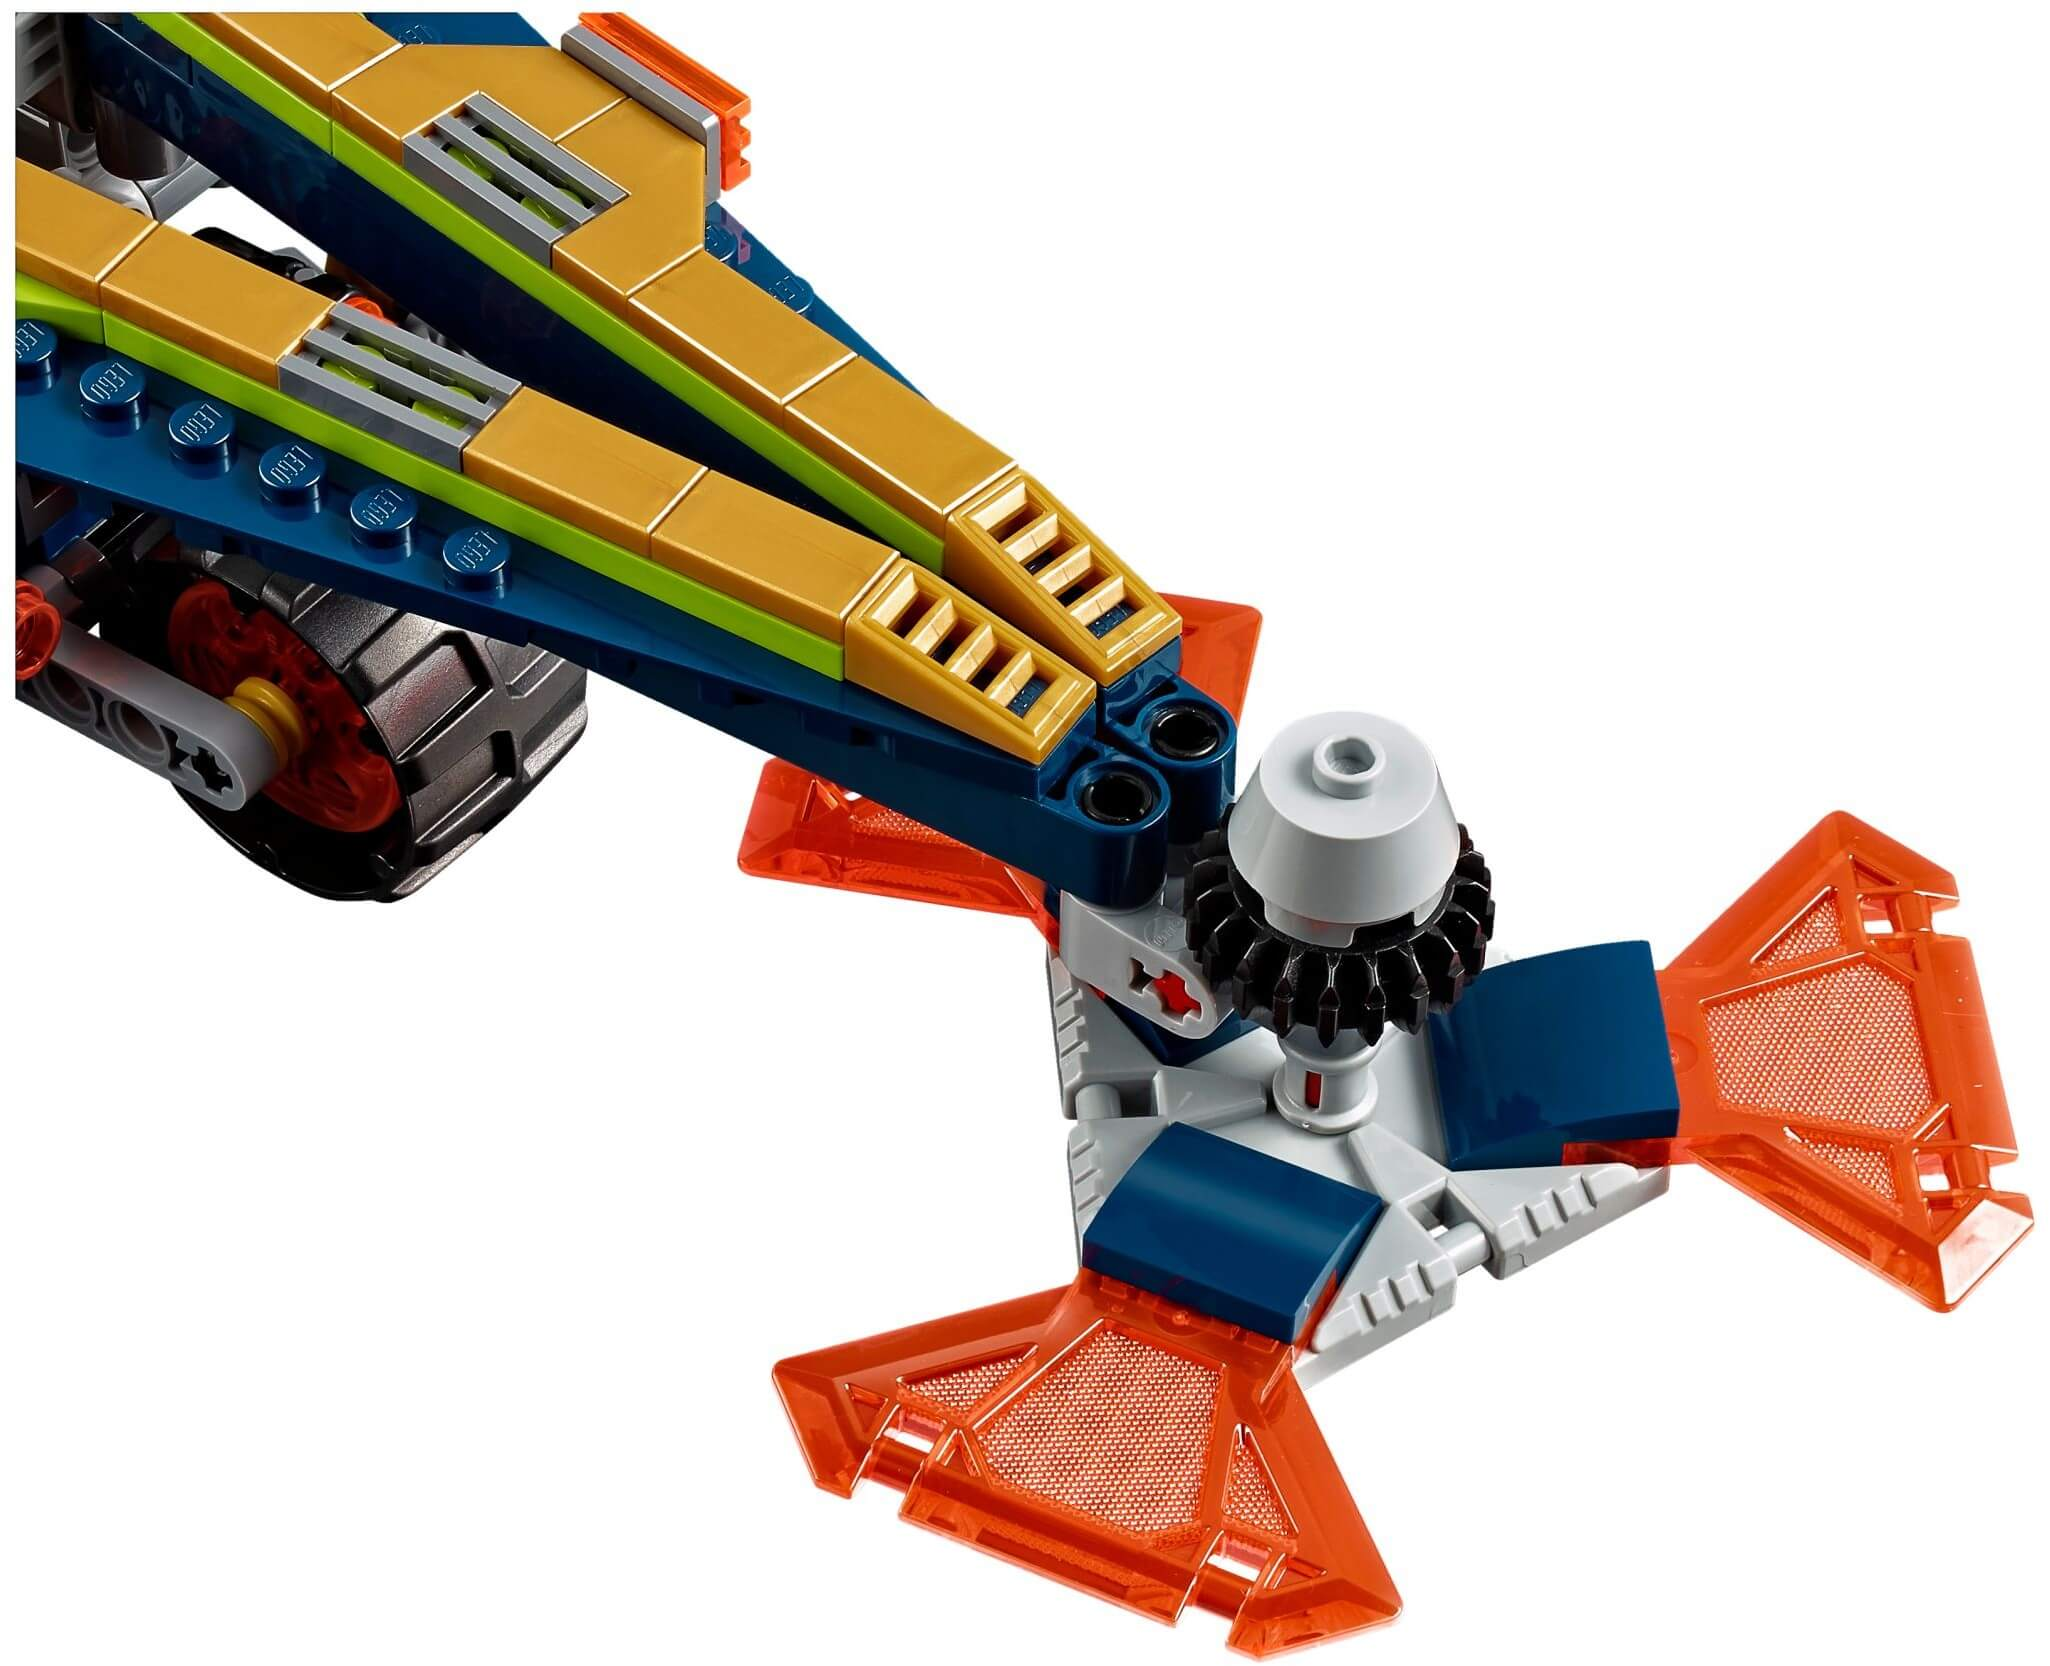 Mua đồ chơi LEGO 72005 - LEGO Nexo Knights 72005 - Máy Bay biến hình của Aaron (LEGO Nexo Knights 72005 Aaron's X-bow)